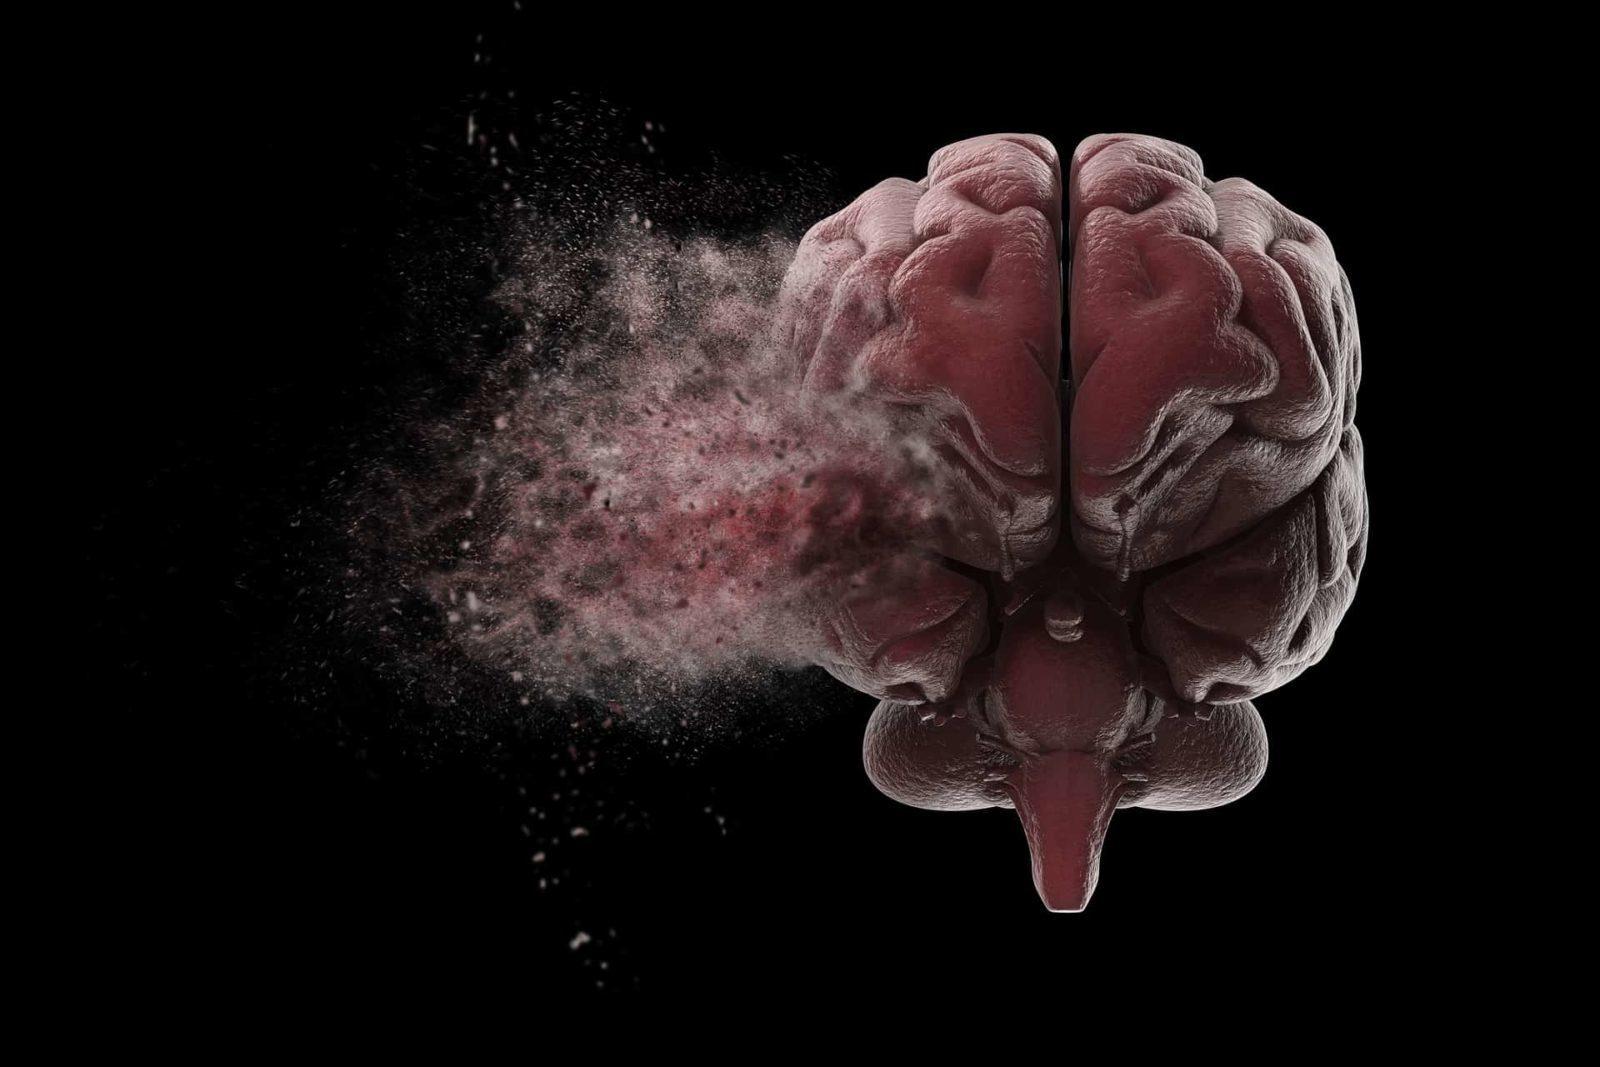 Zet je brein vaker op pauze